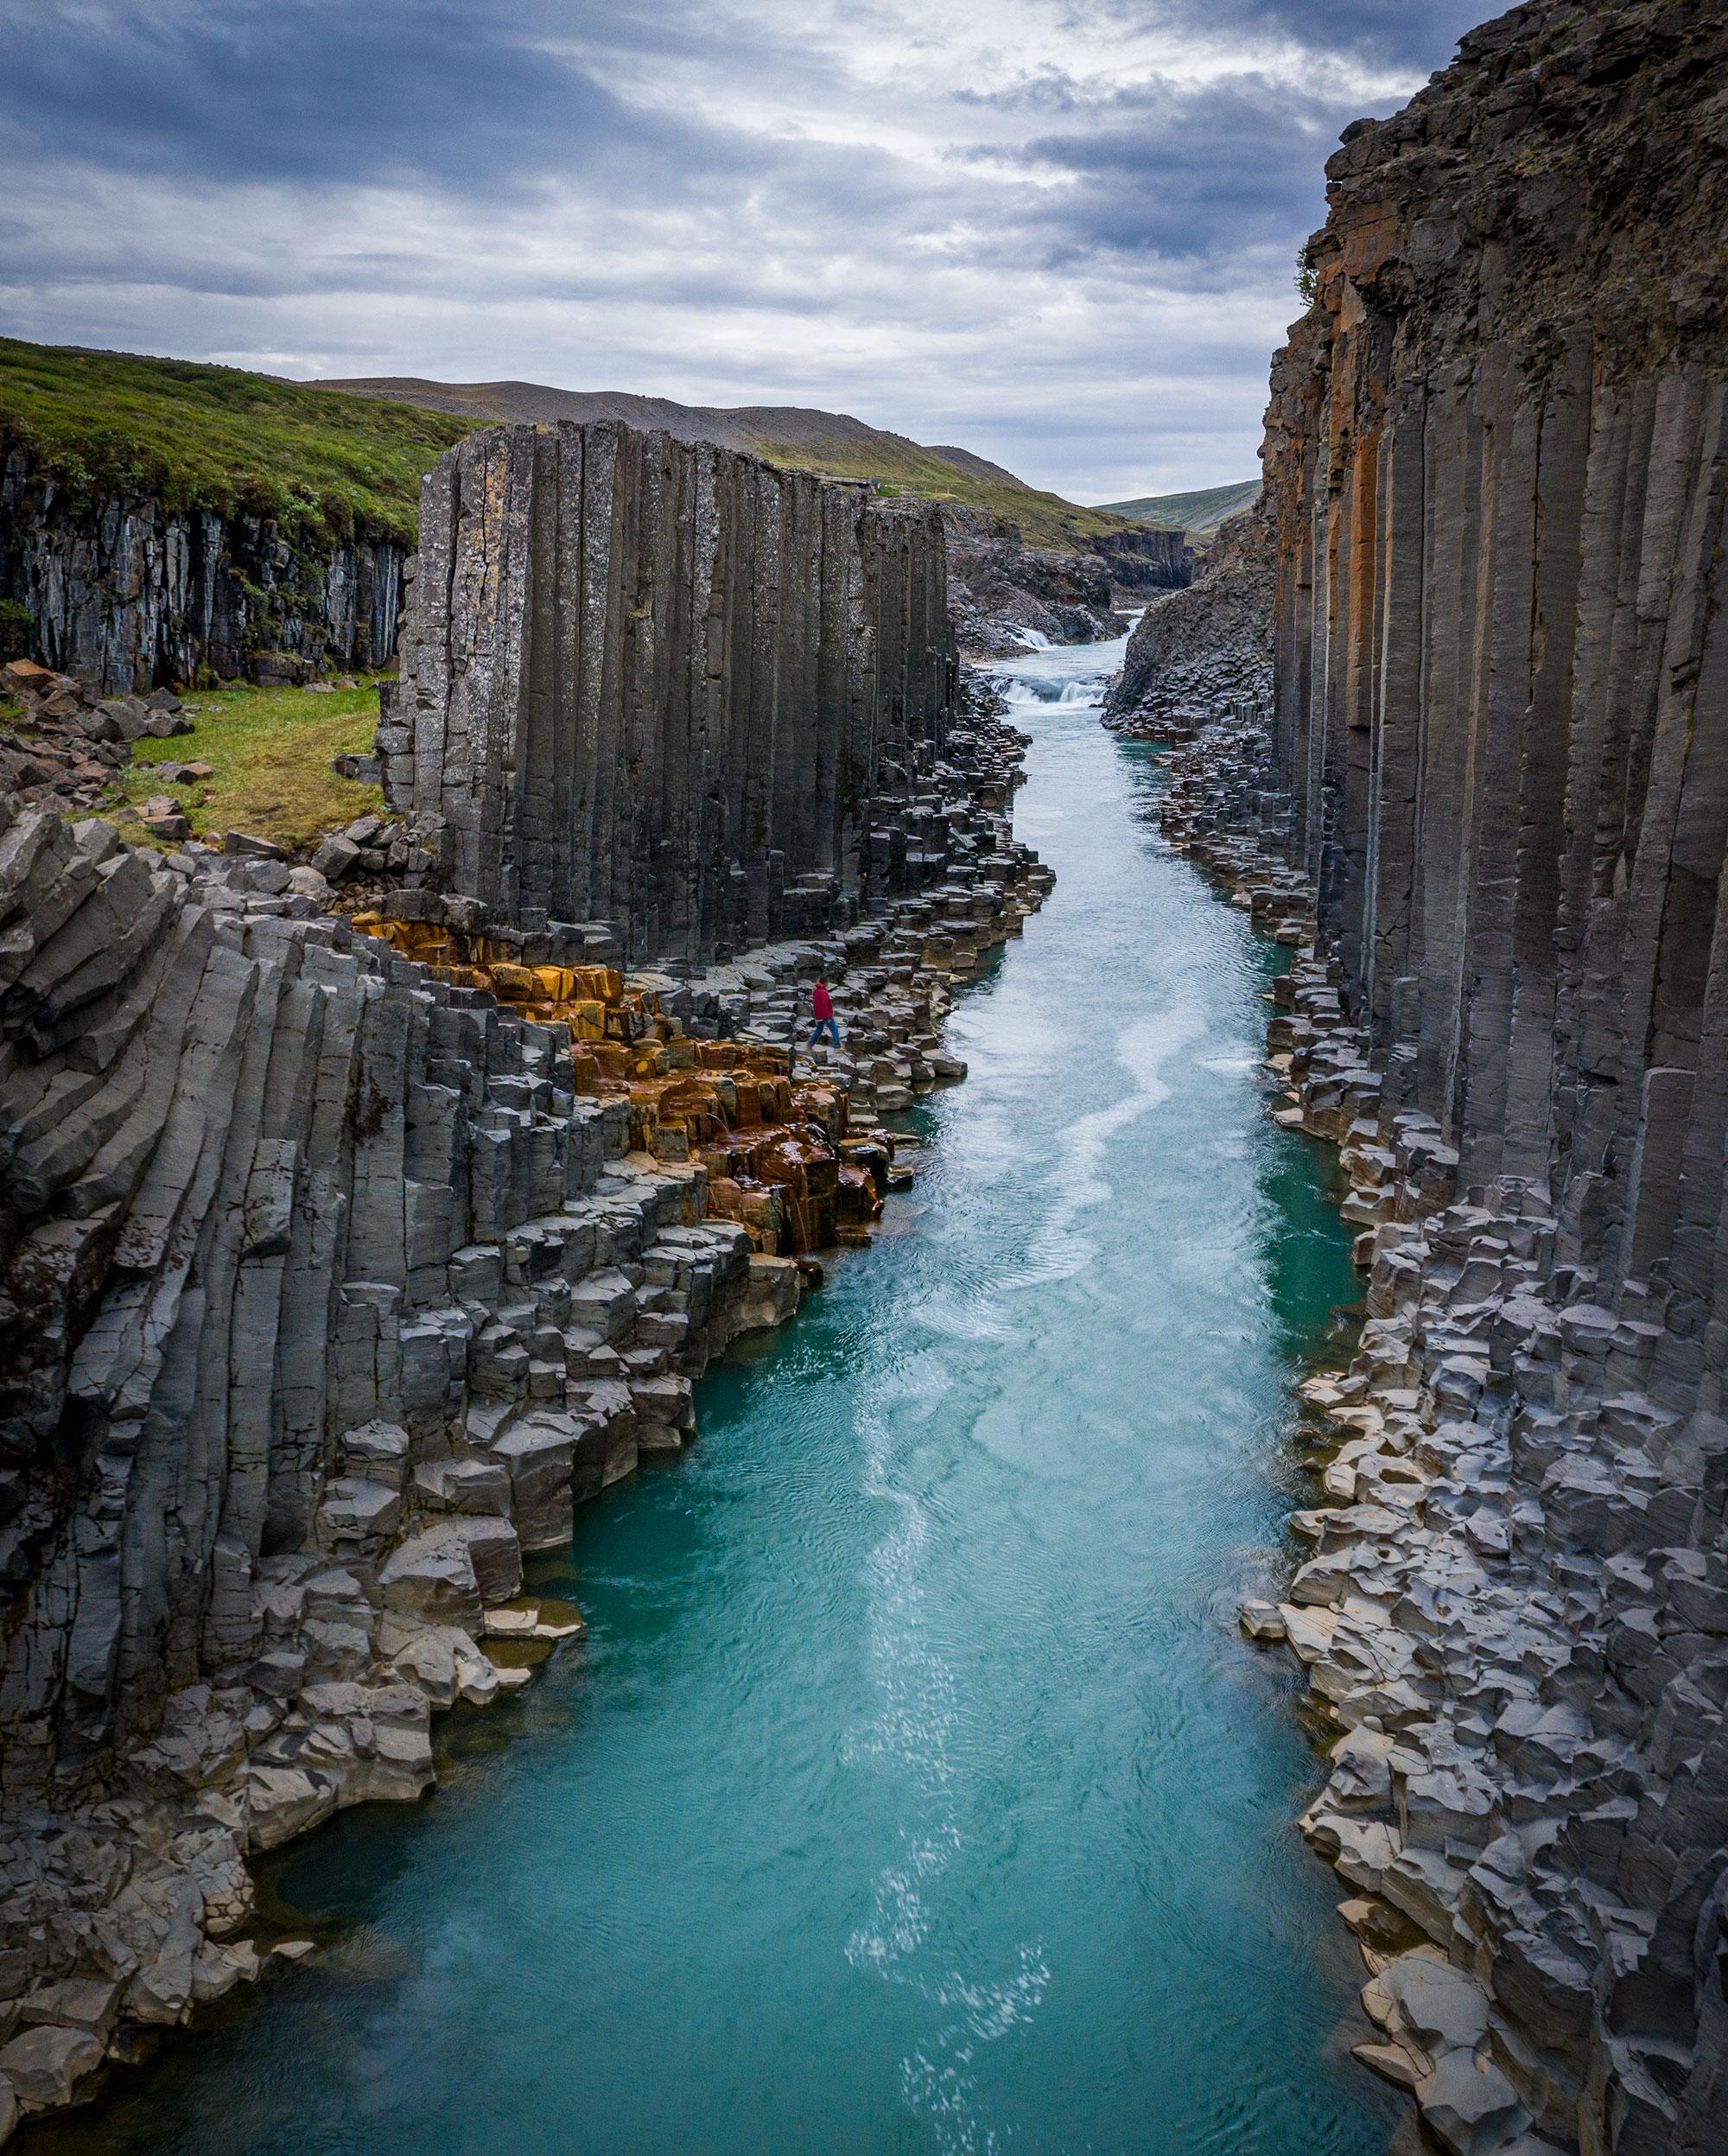 Hexagonal basalt rock column walls lining a river canyon in east Iceland.